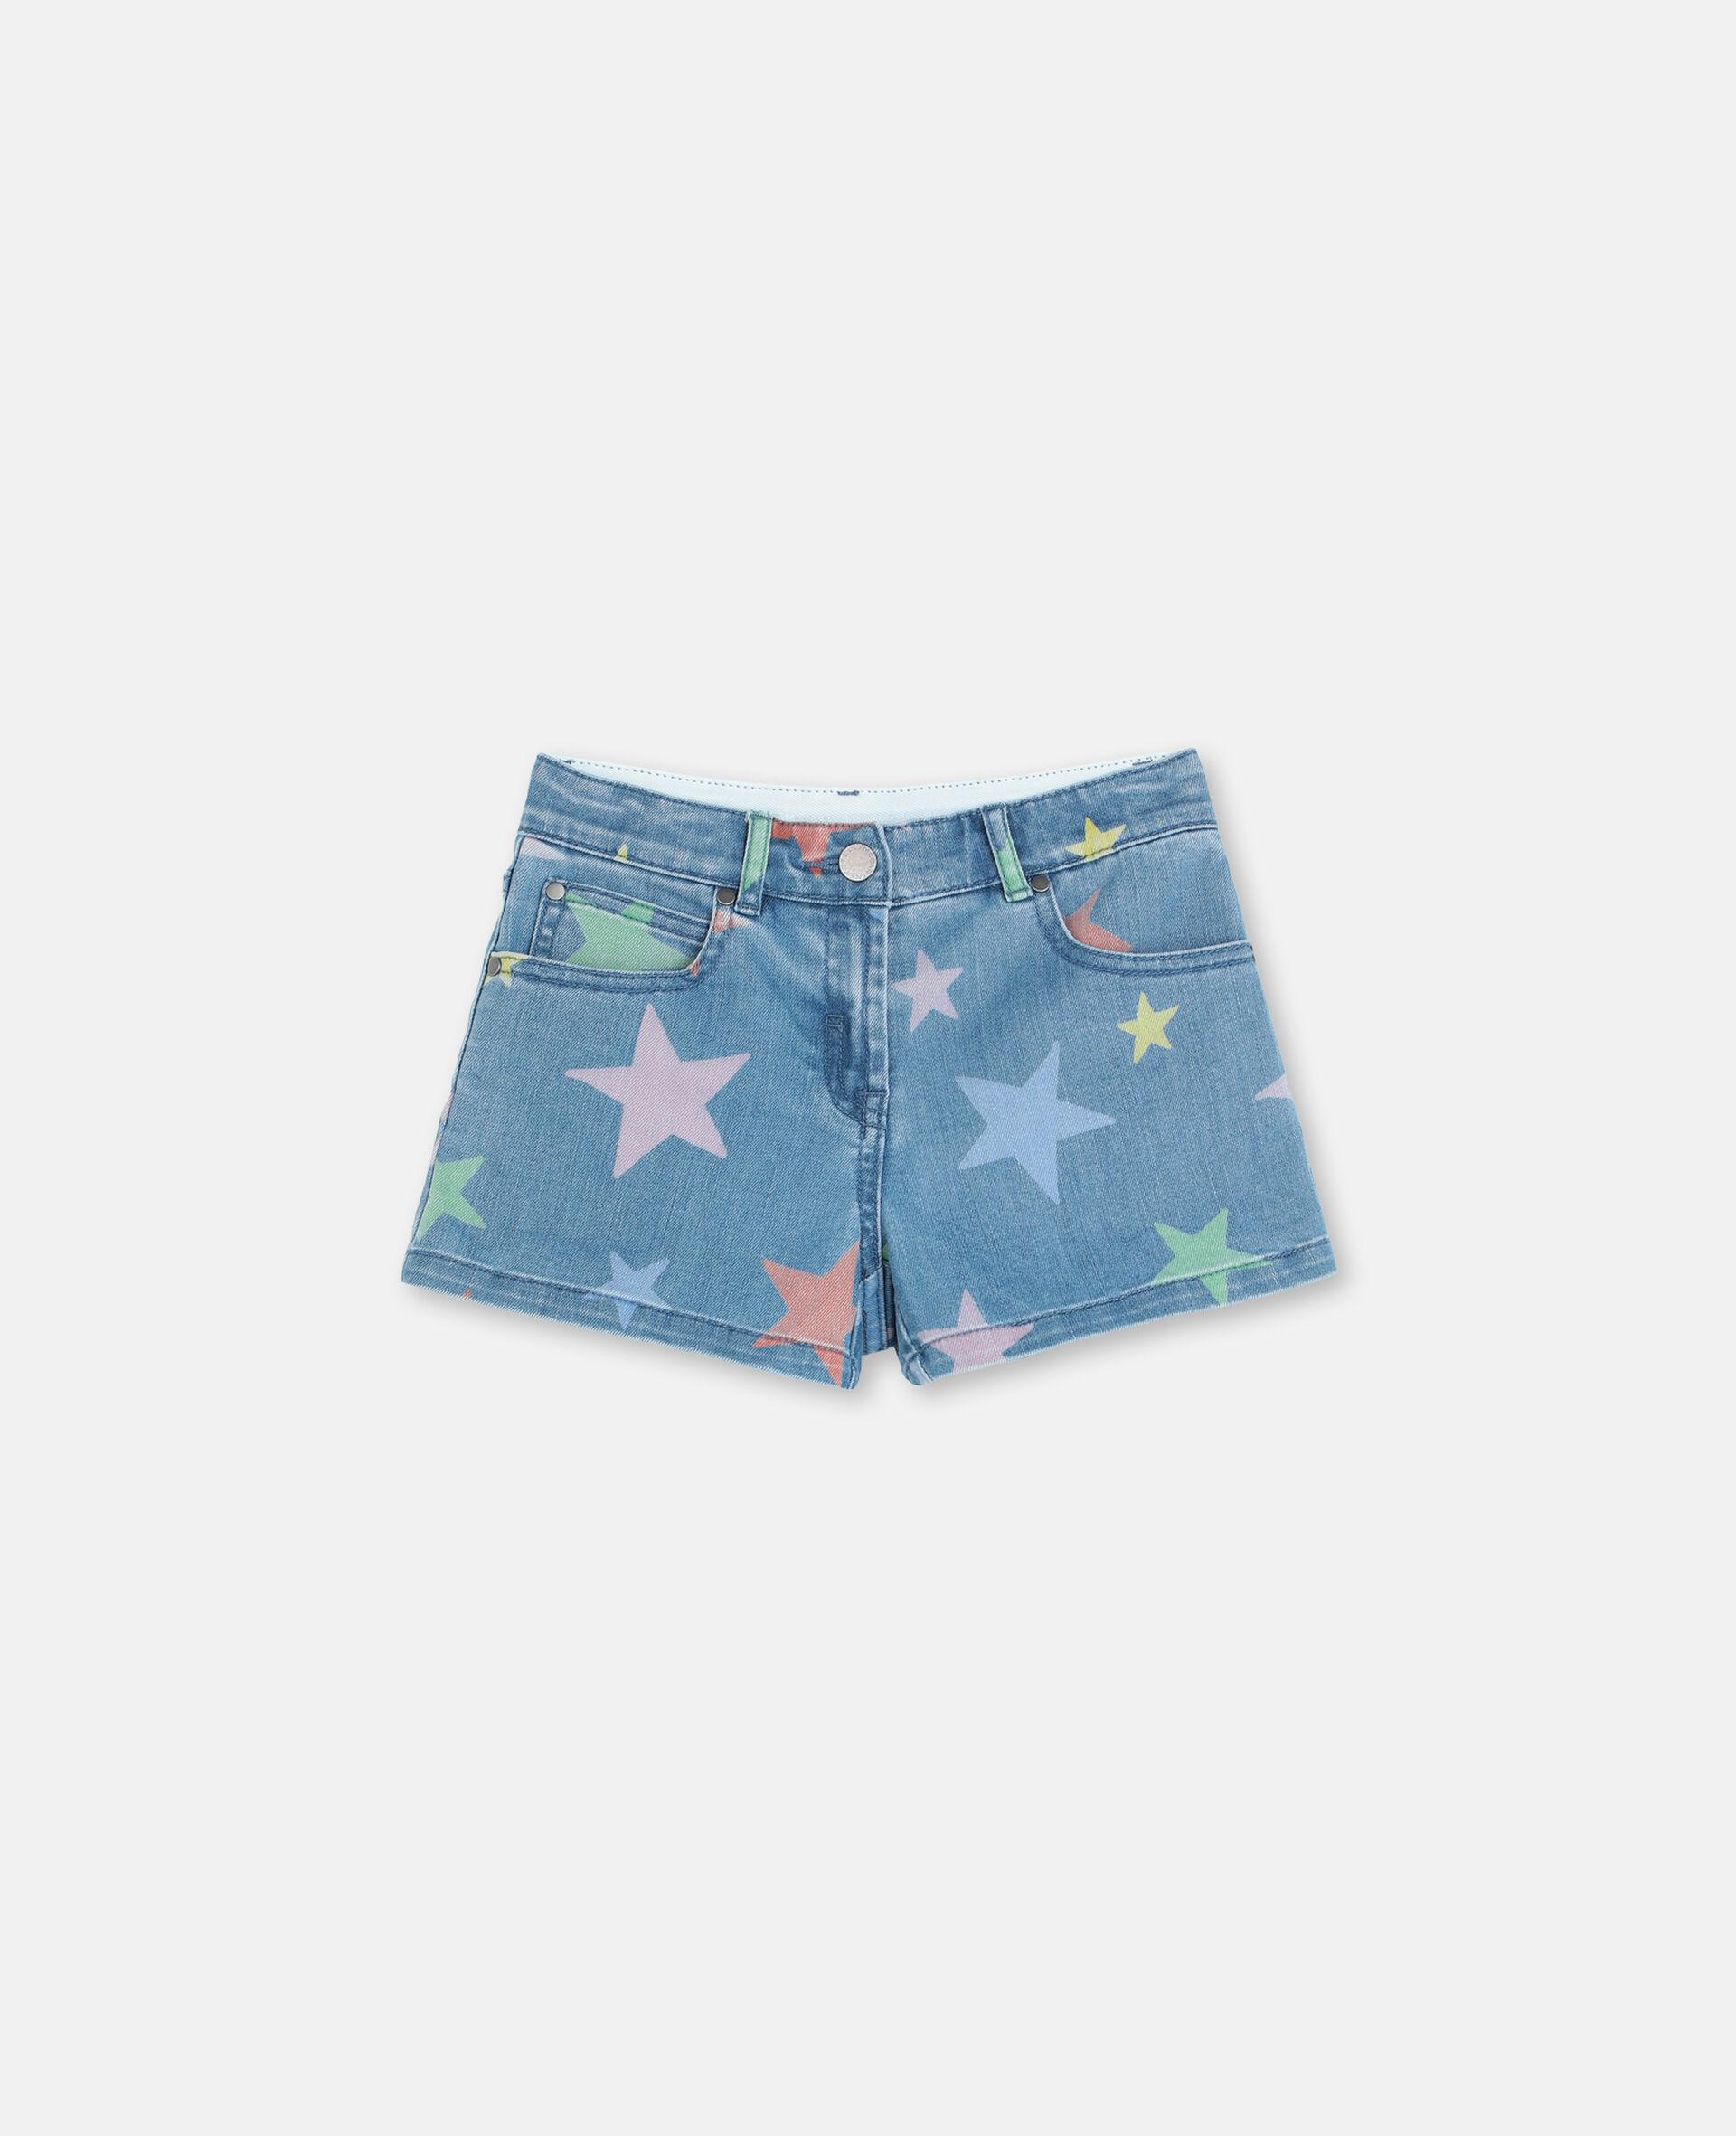 Multicolour Stars Denim Shorts -Multicolour-large image number 0